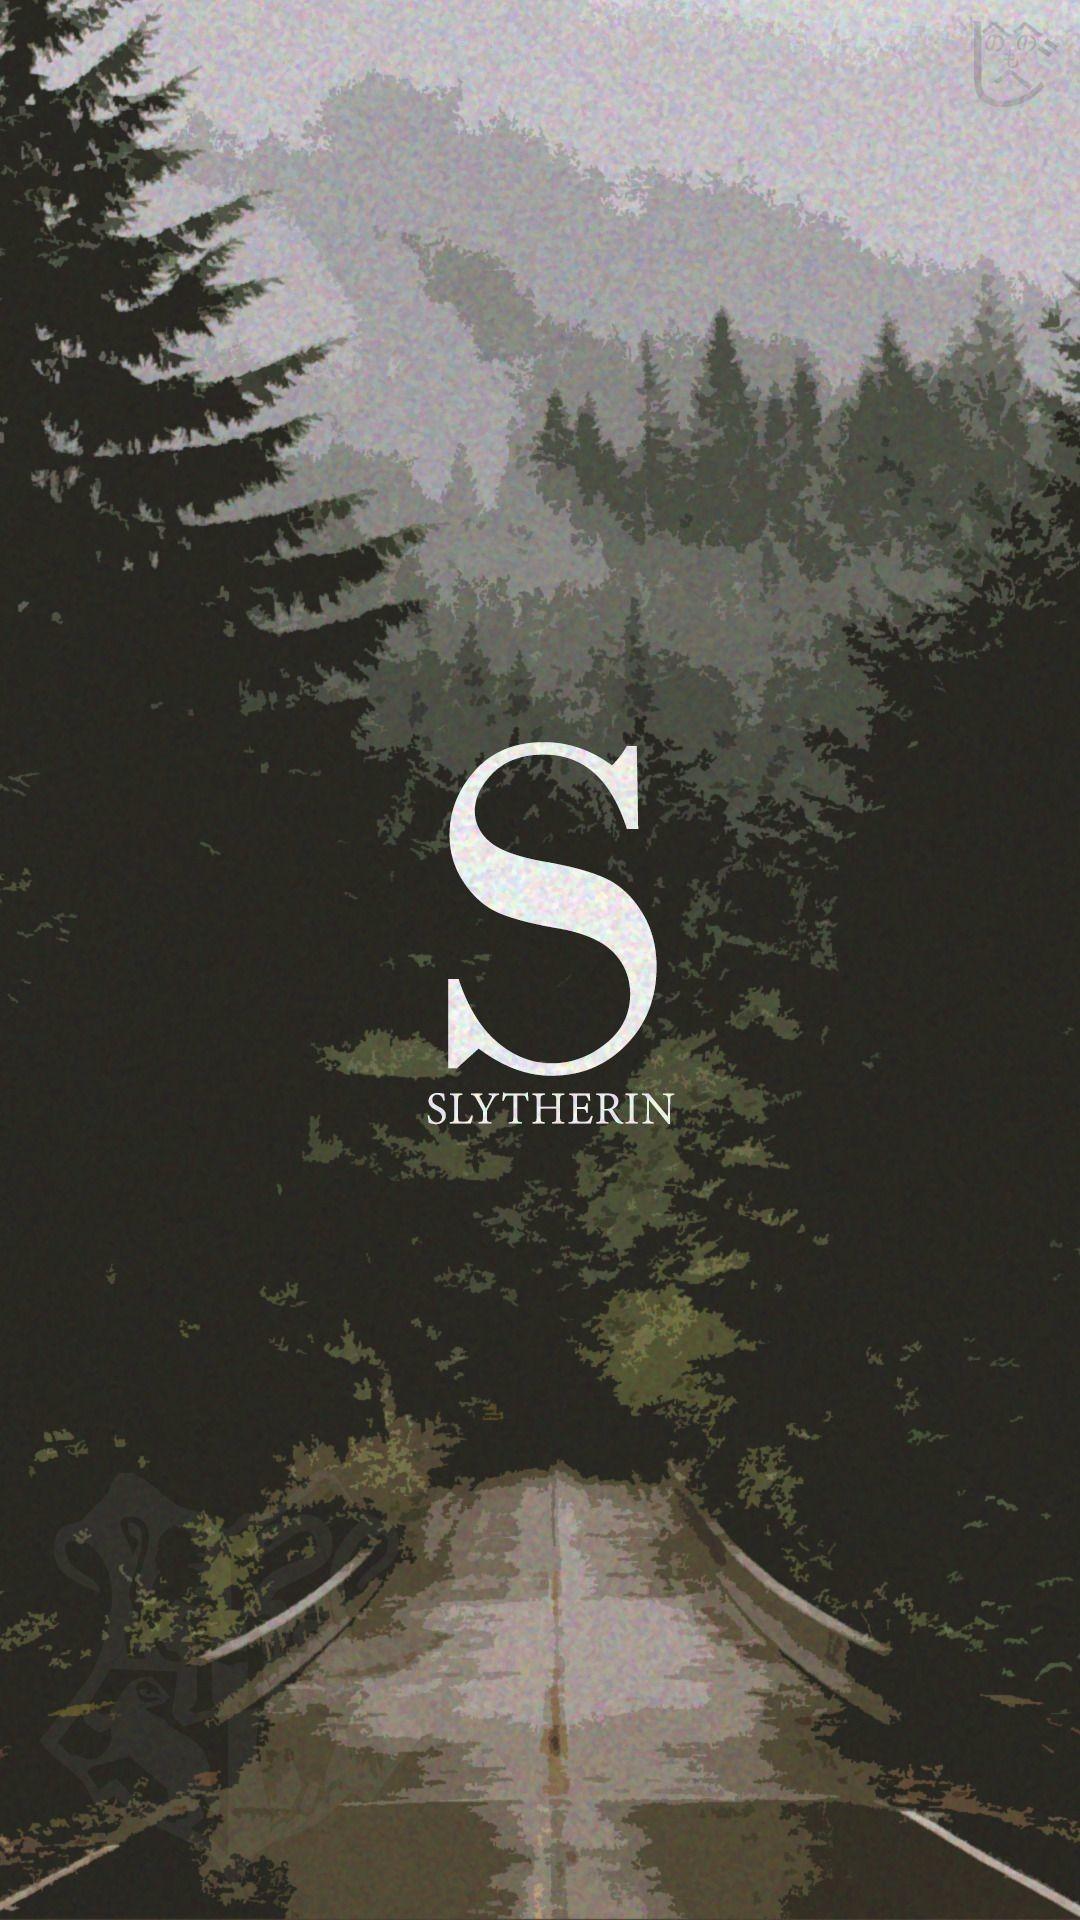 Slytherin Wallpaper - Aesthetic Slytherin Background - HD Wallpaper